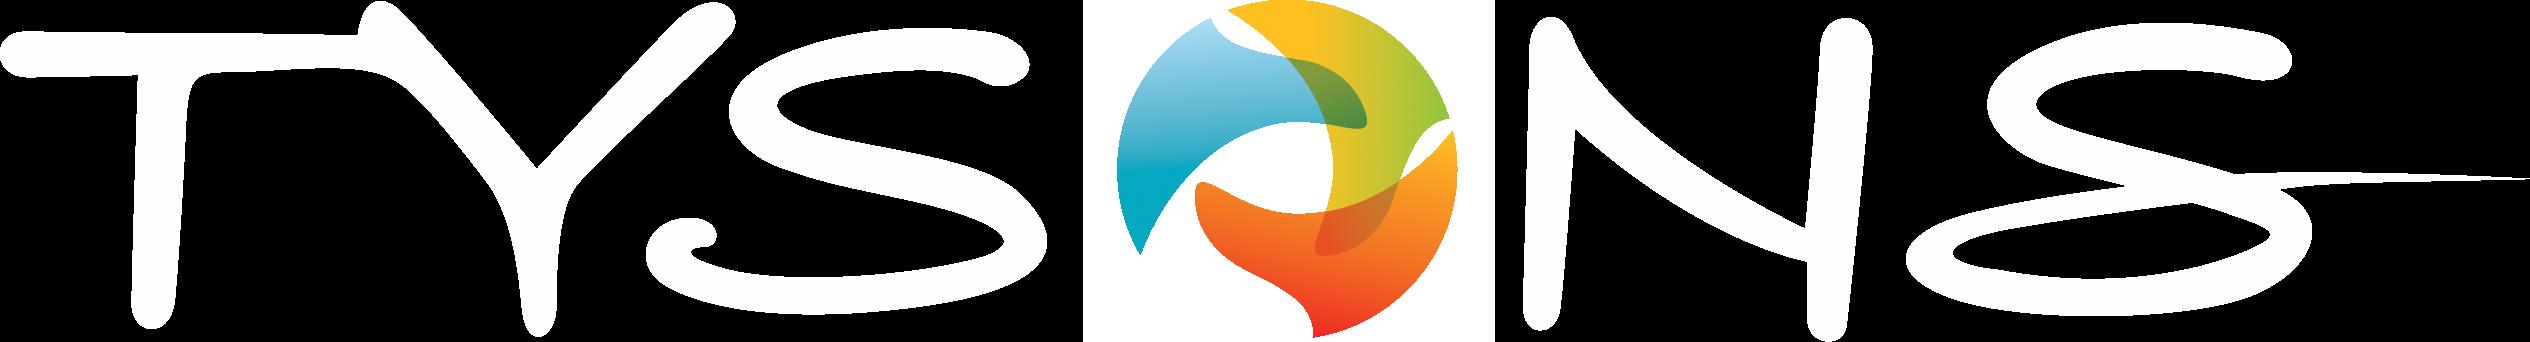 tysons partnership logo